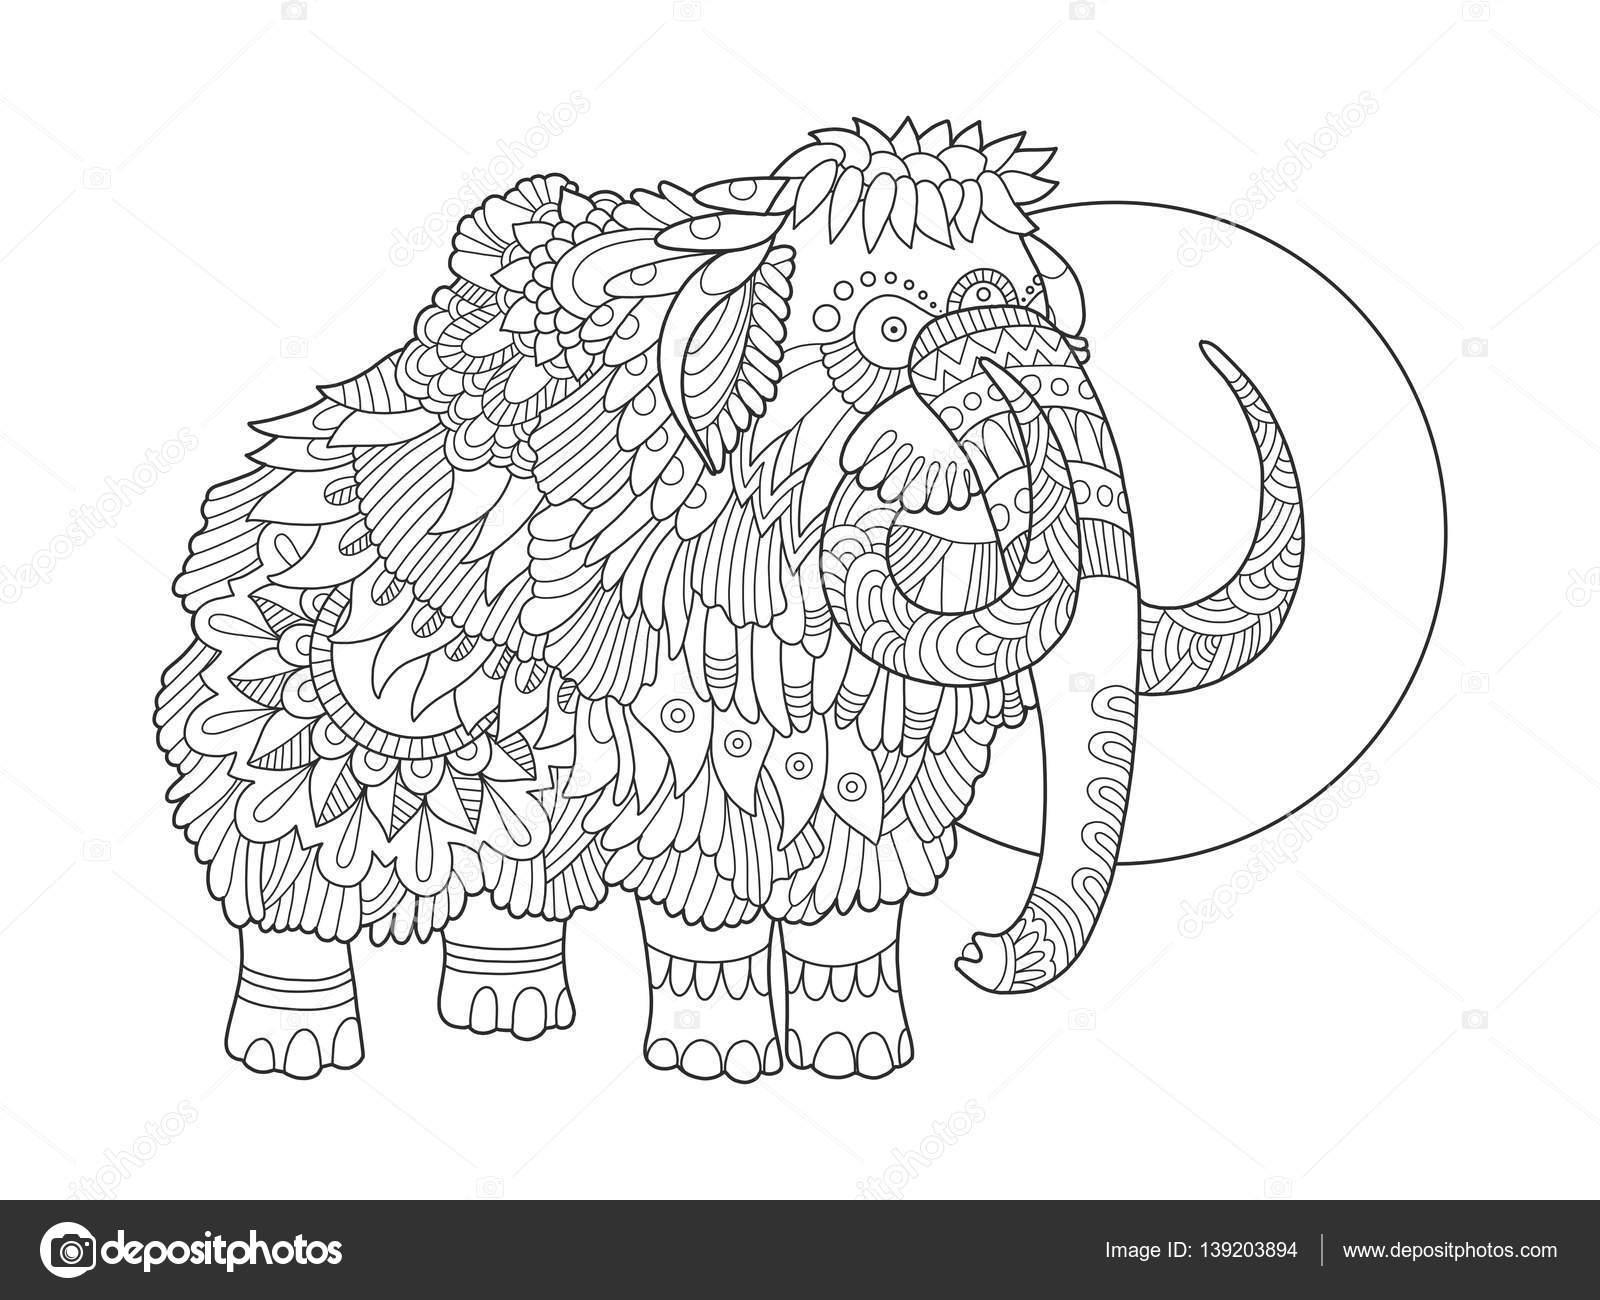 Dibujo Mamut Colorear Mamut Para Colorear Ilustración Vectorial